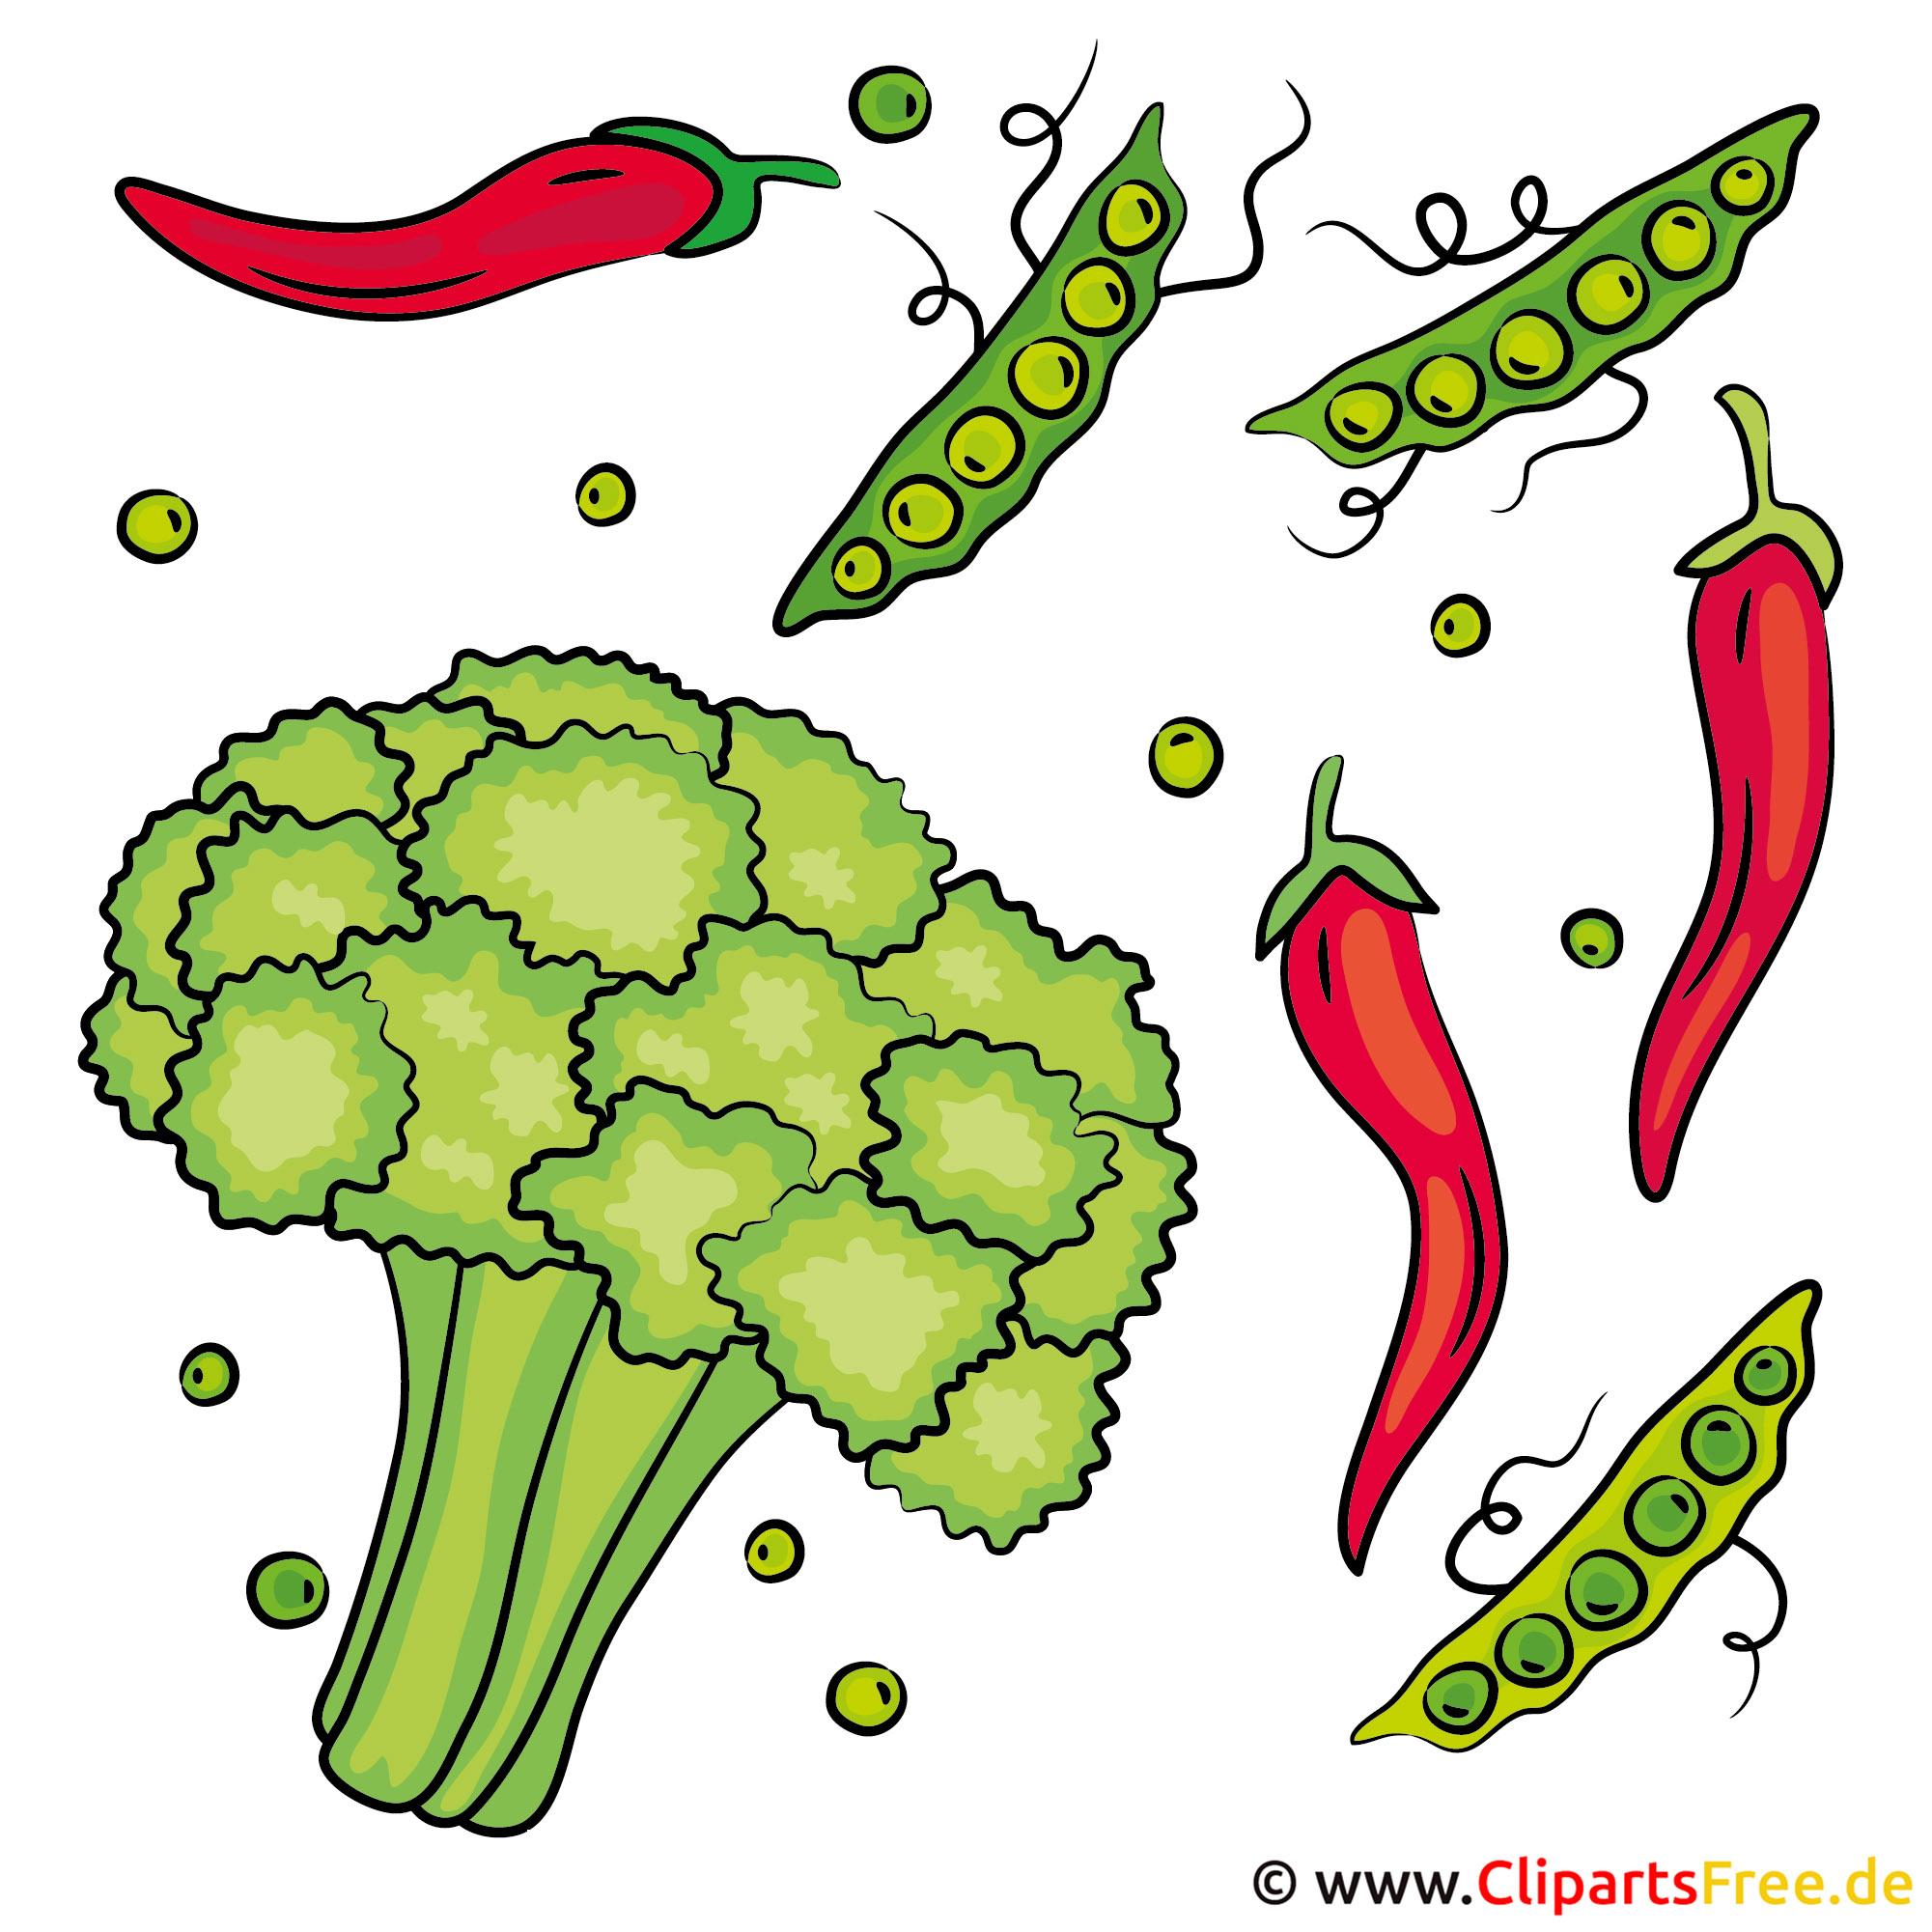 Cartoons Gemüse kostenlos